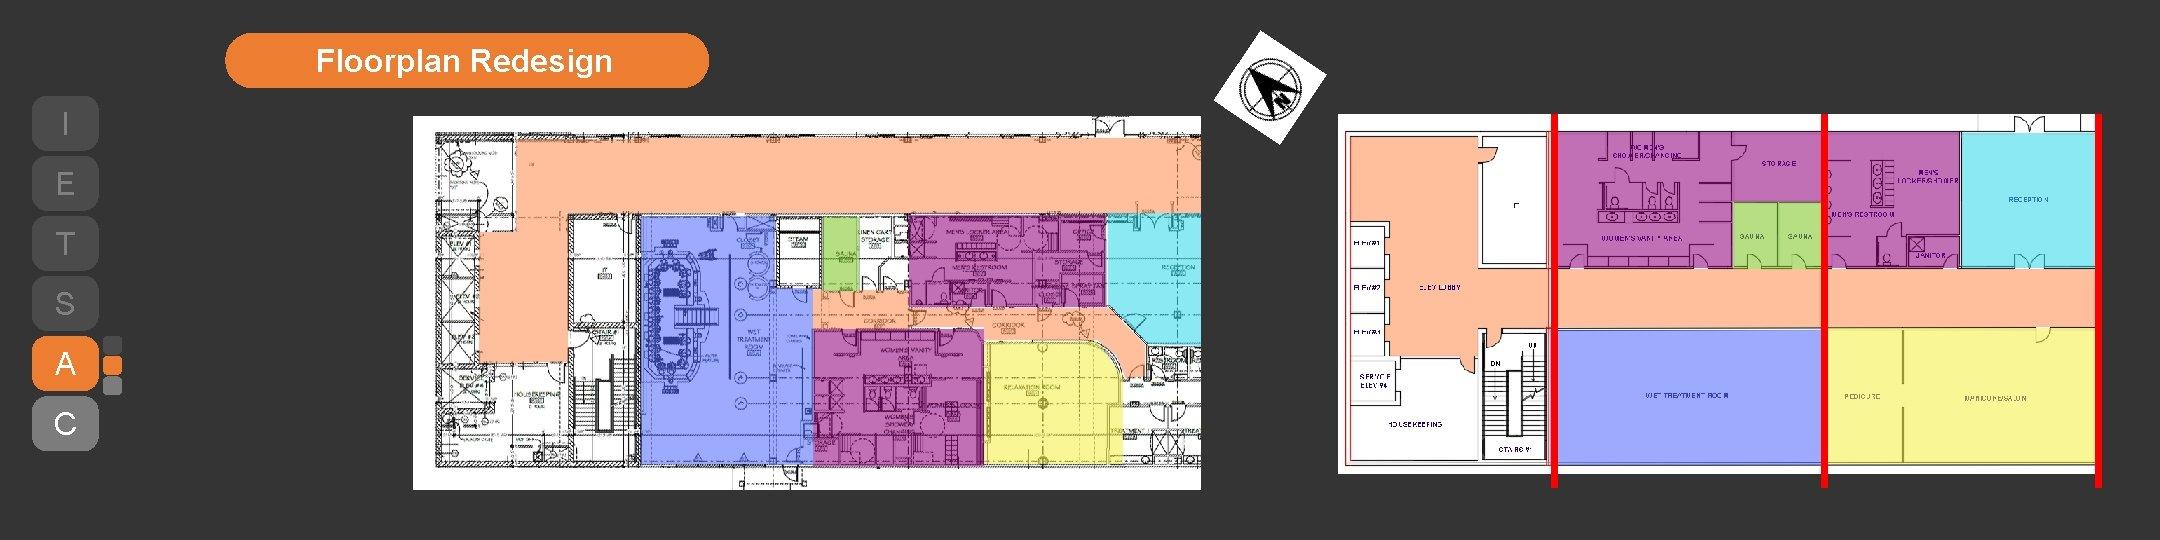 Floorplan Redesign I E T S A C